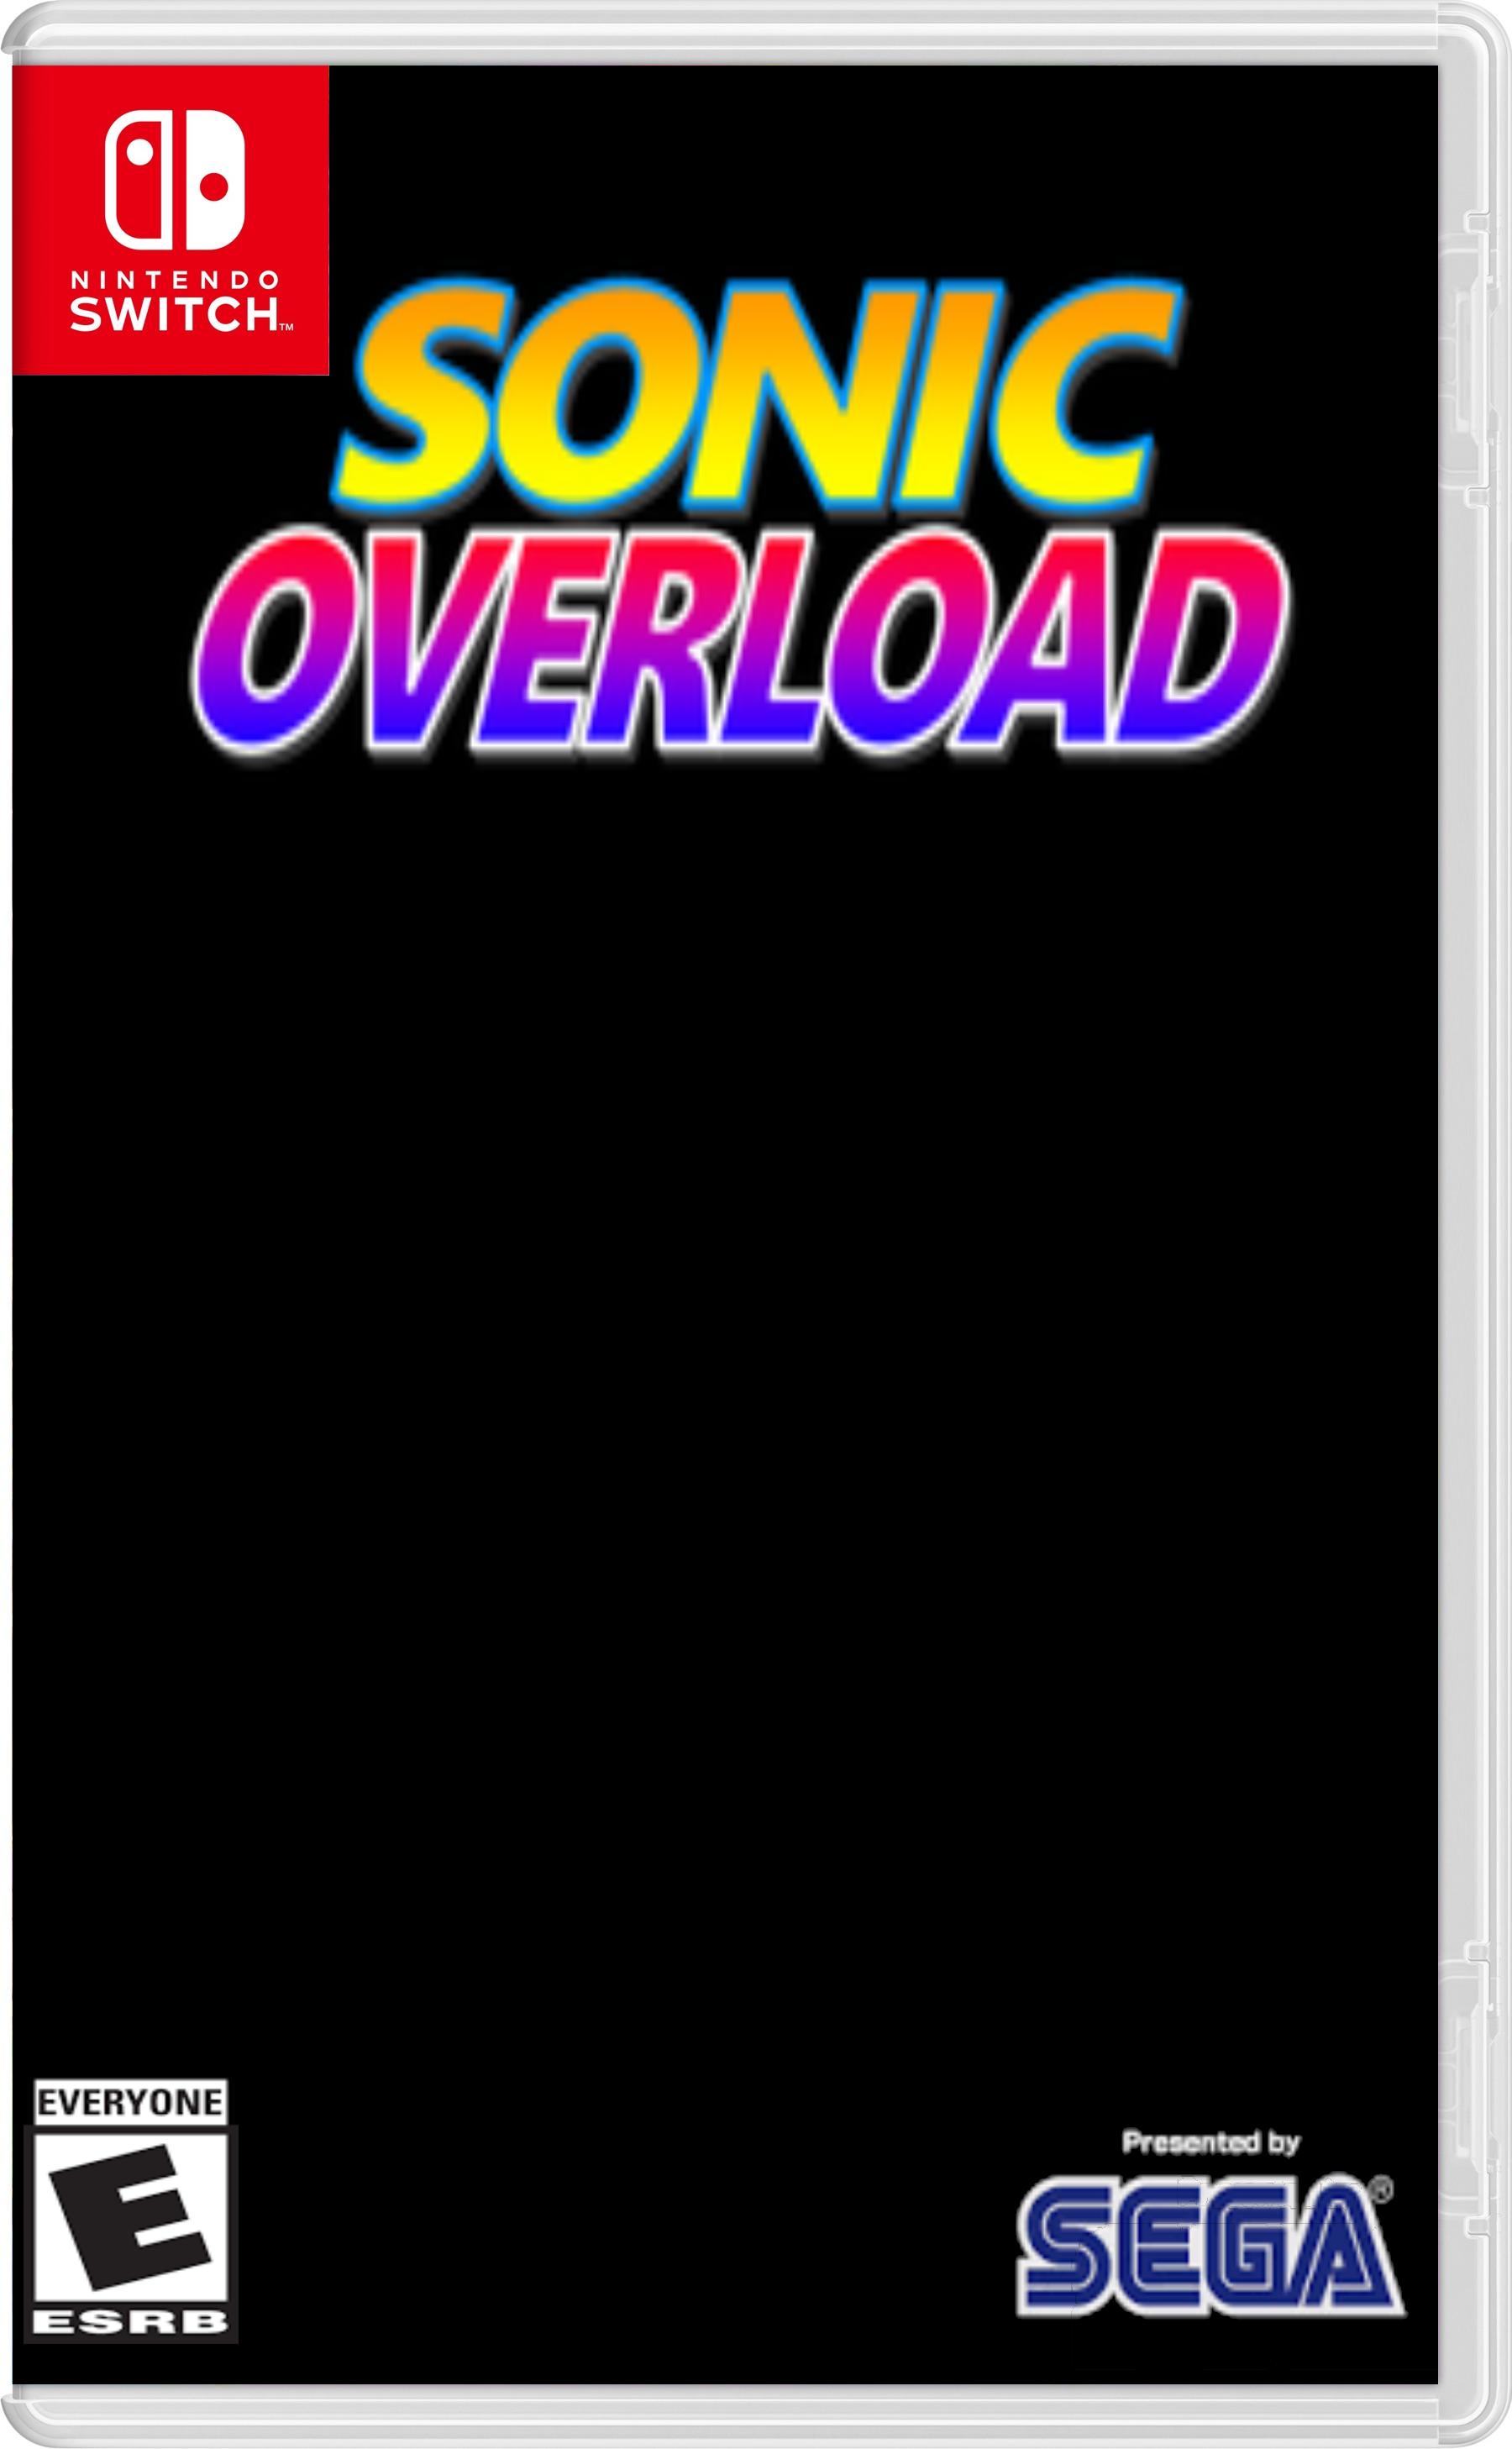 Sonic Overload(Heroic412229's version)